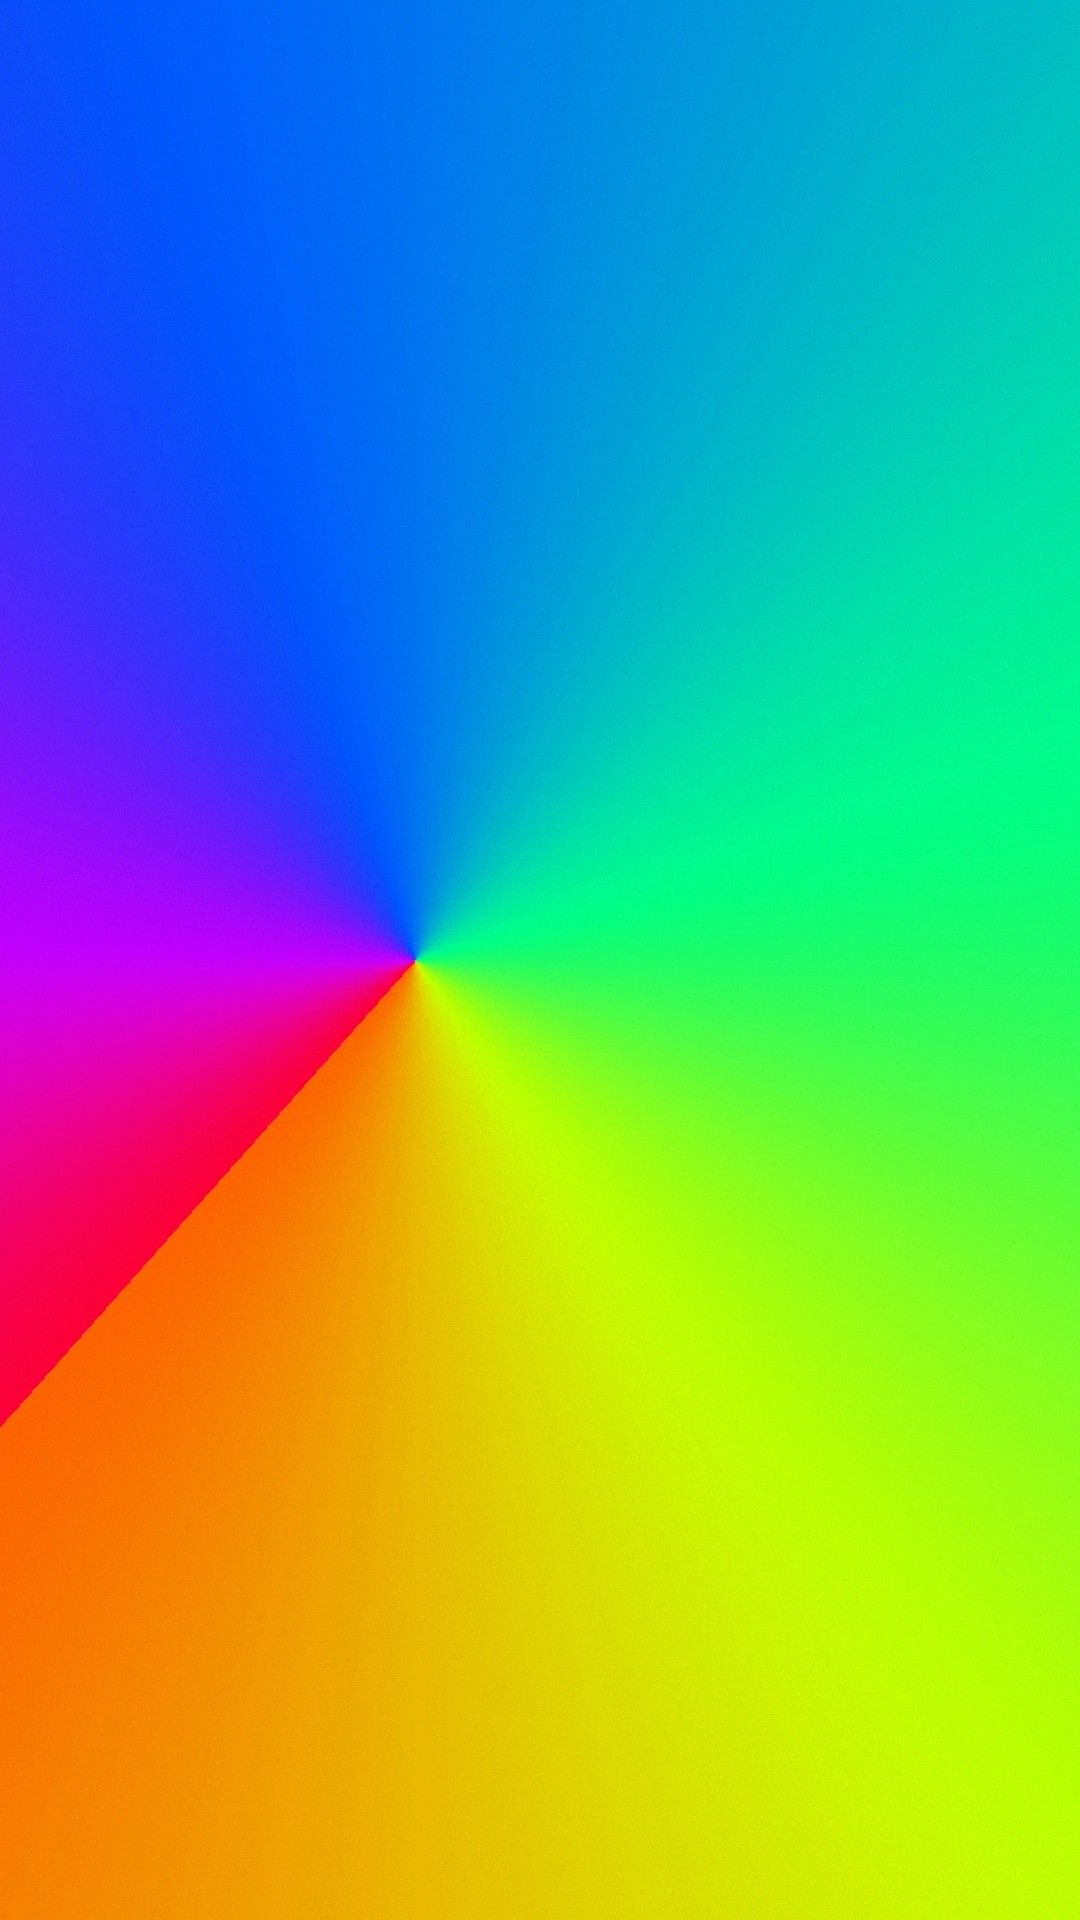 Most Inspiring Wallpaper Mobile Colorful - b9877b96316d1aa7a5fd977b0e6fbe44  2018_1912.jpg